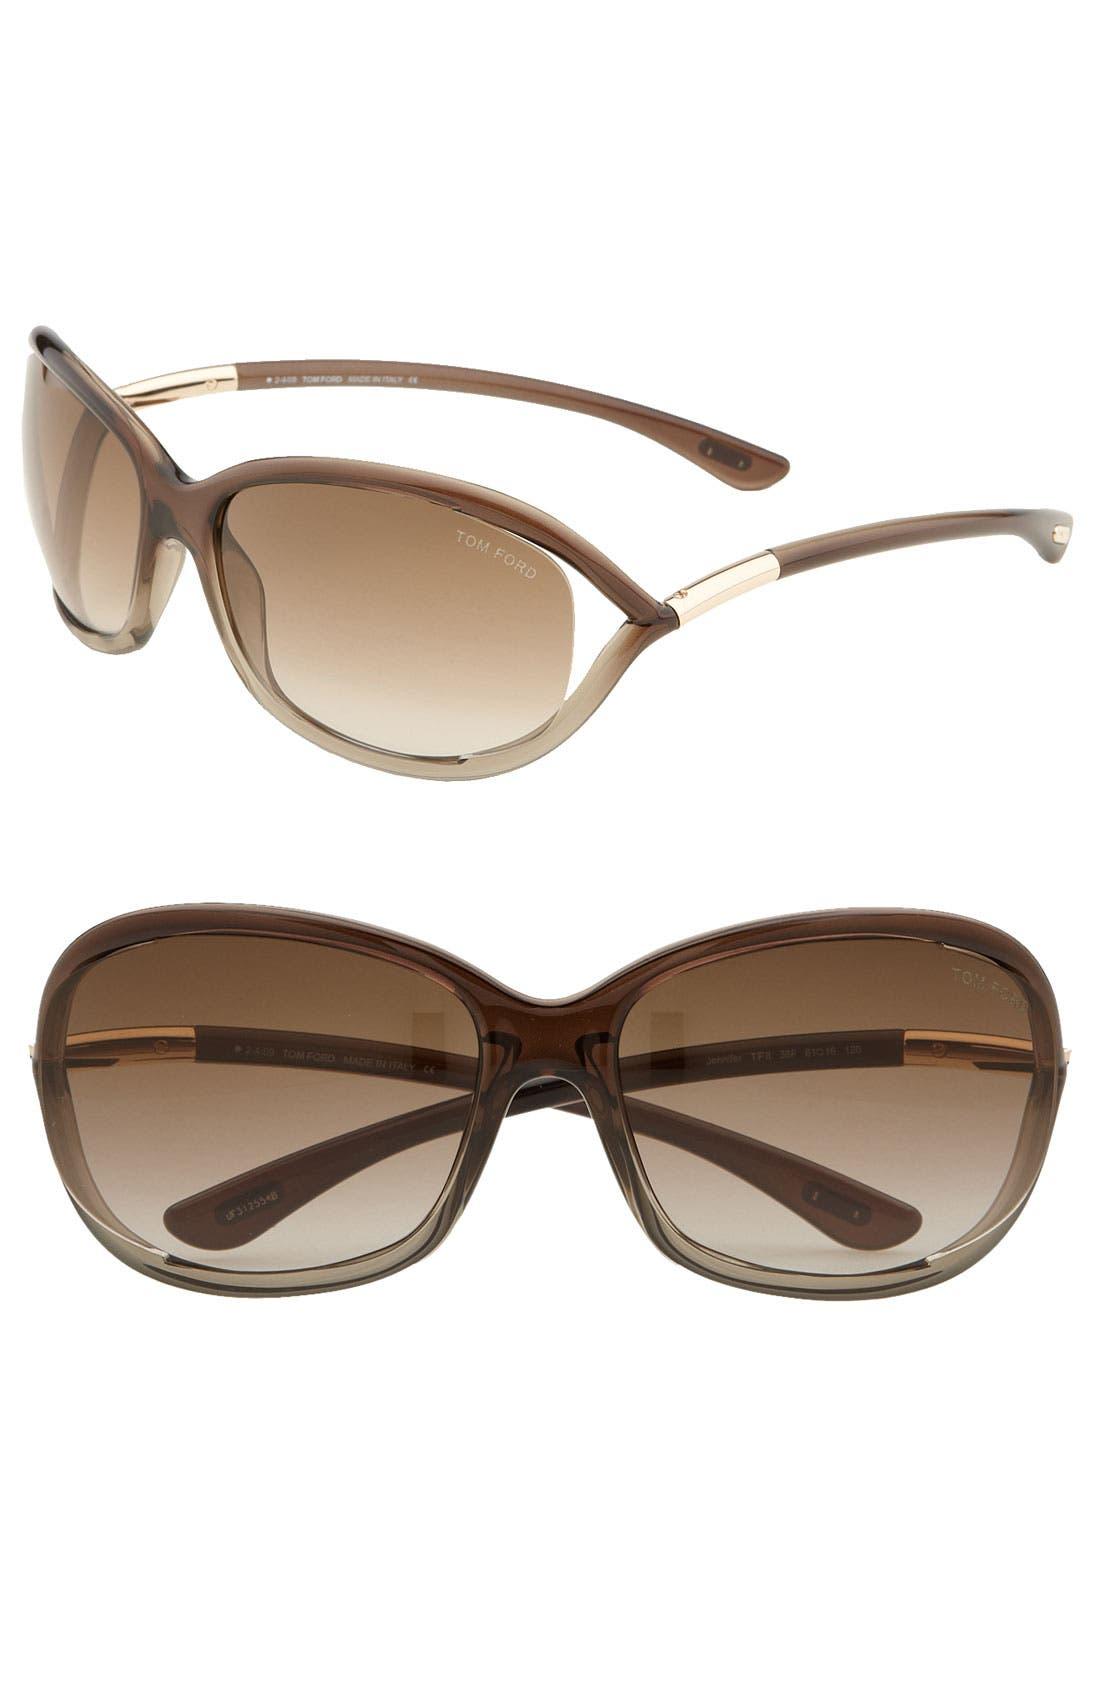 Tom Ford 'Jennifer' 61mm Oval Oversize Frame Sunglasses